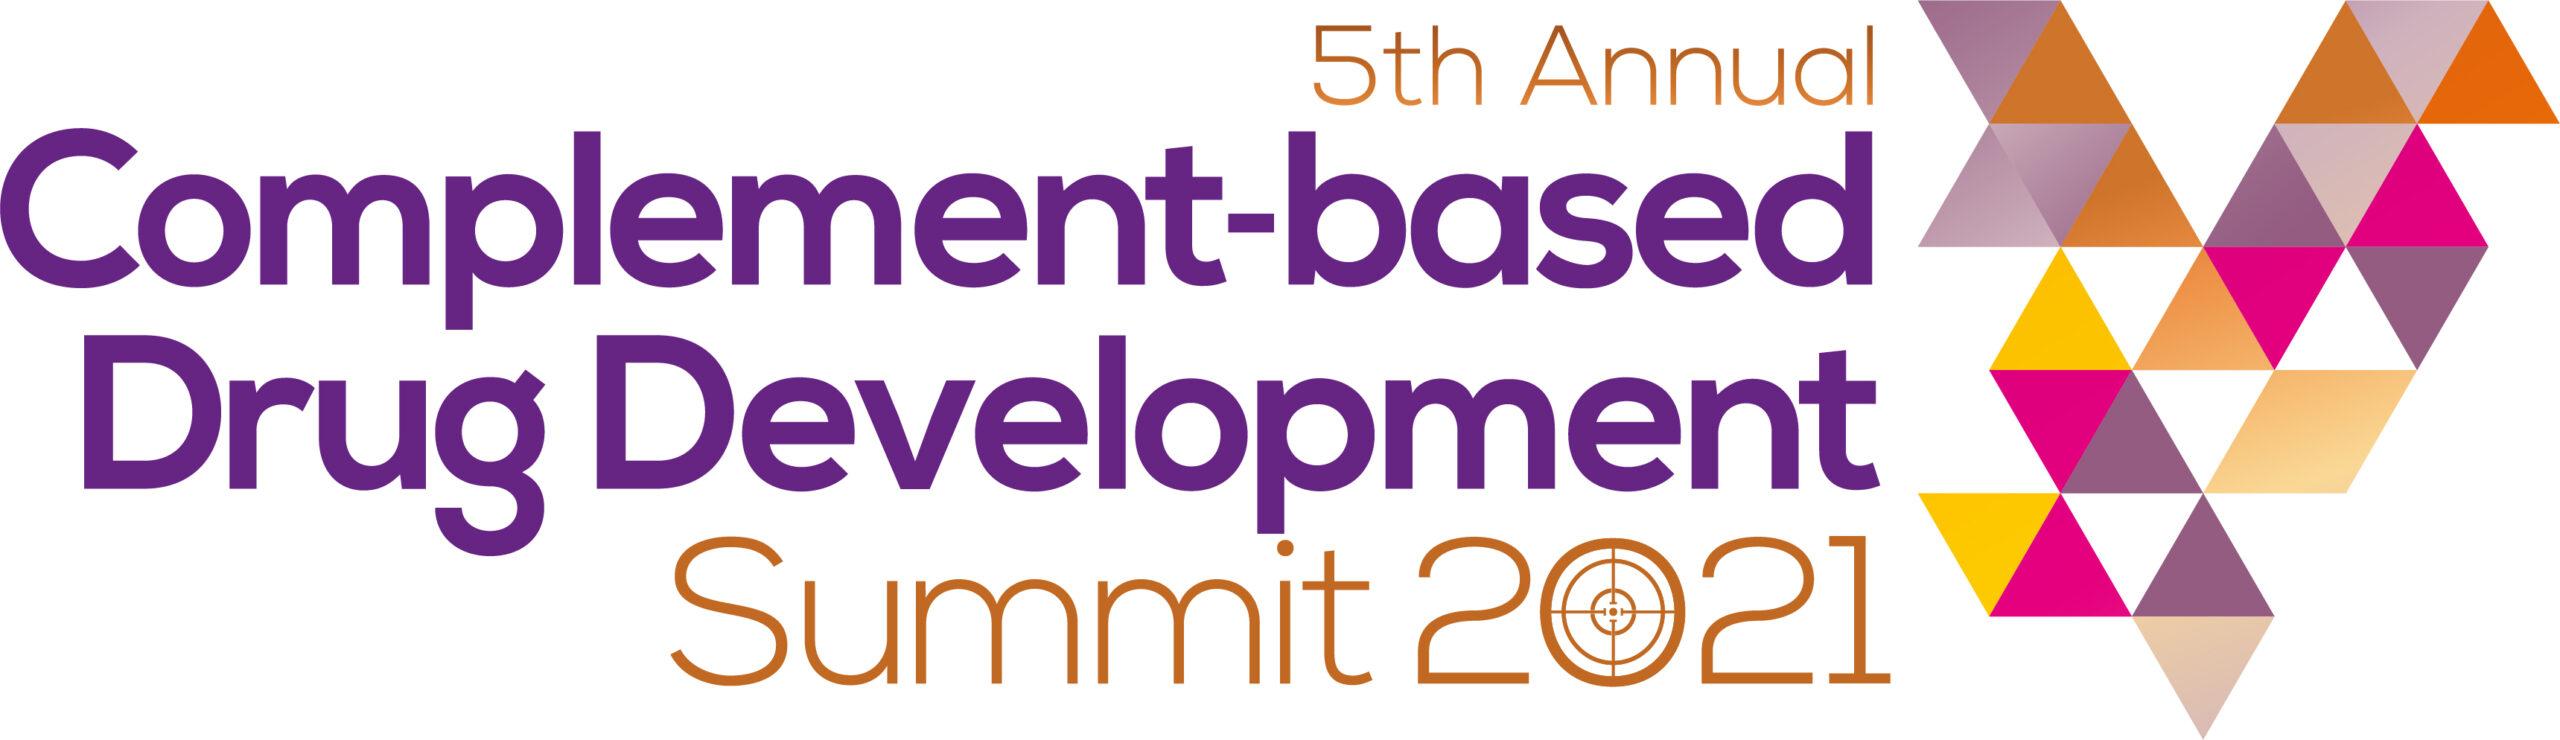 Complement-Based Drug Development Summit